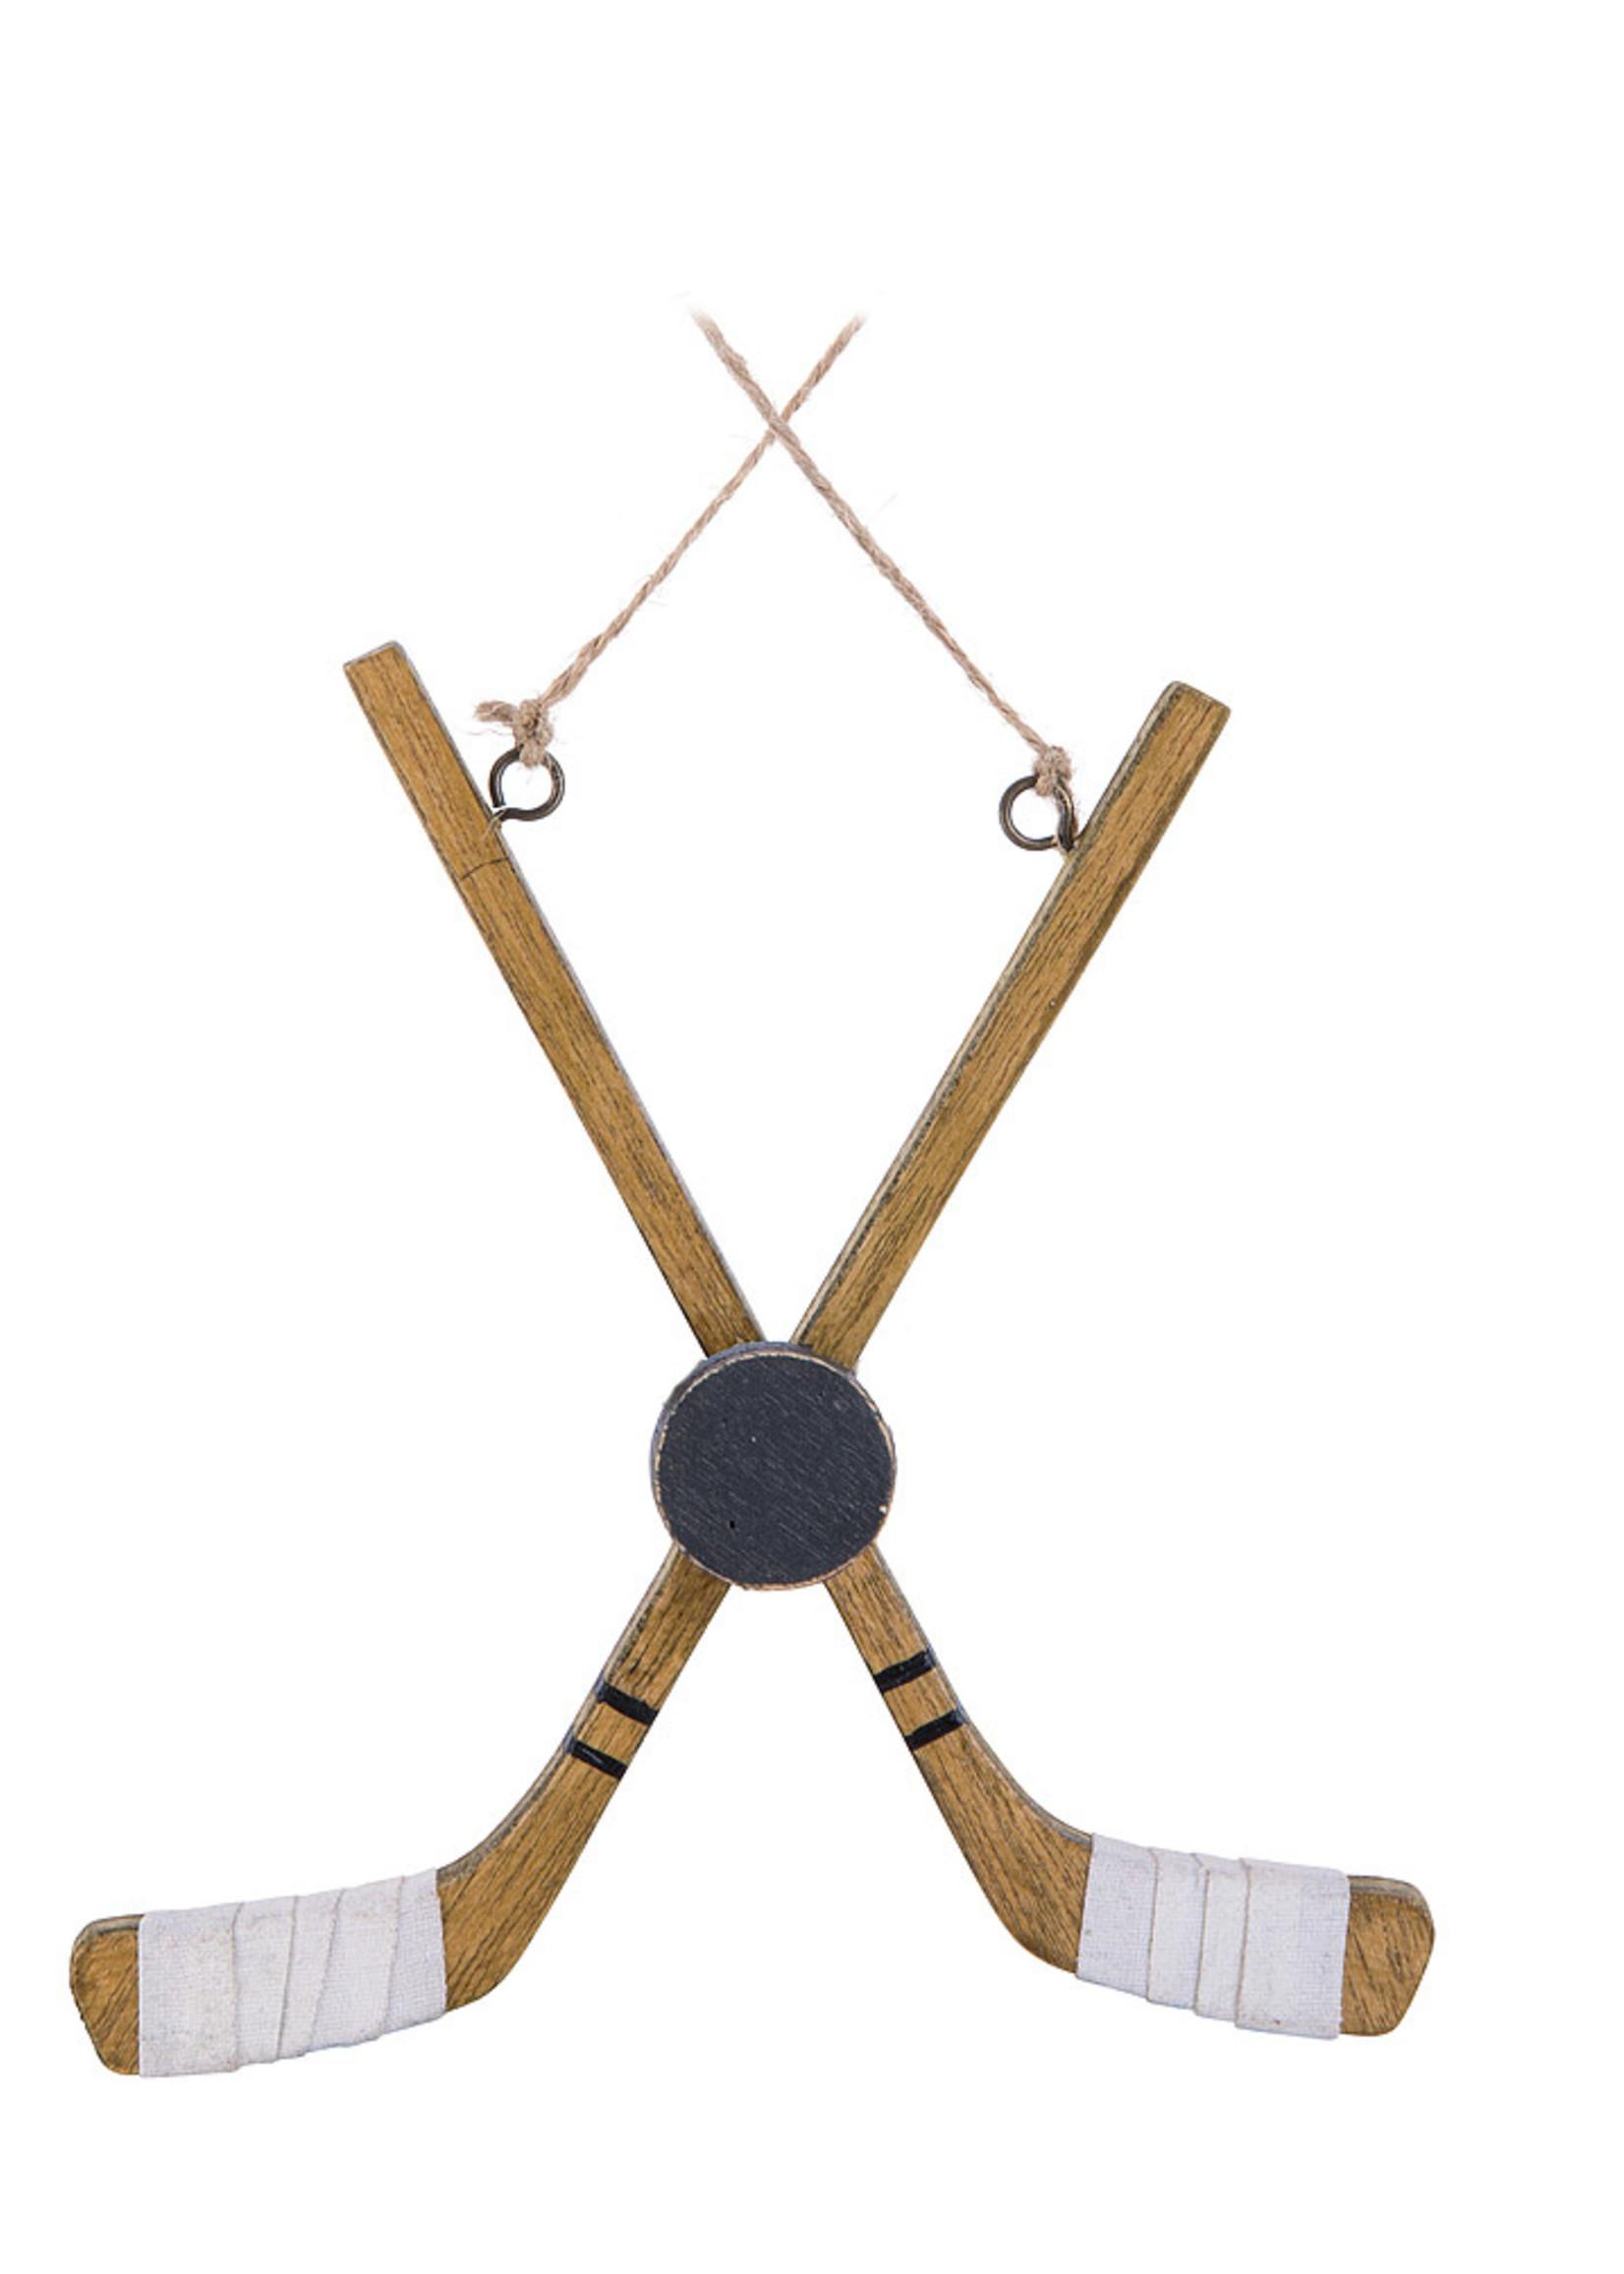 Abbott Hockey Stick/Puck Ornament